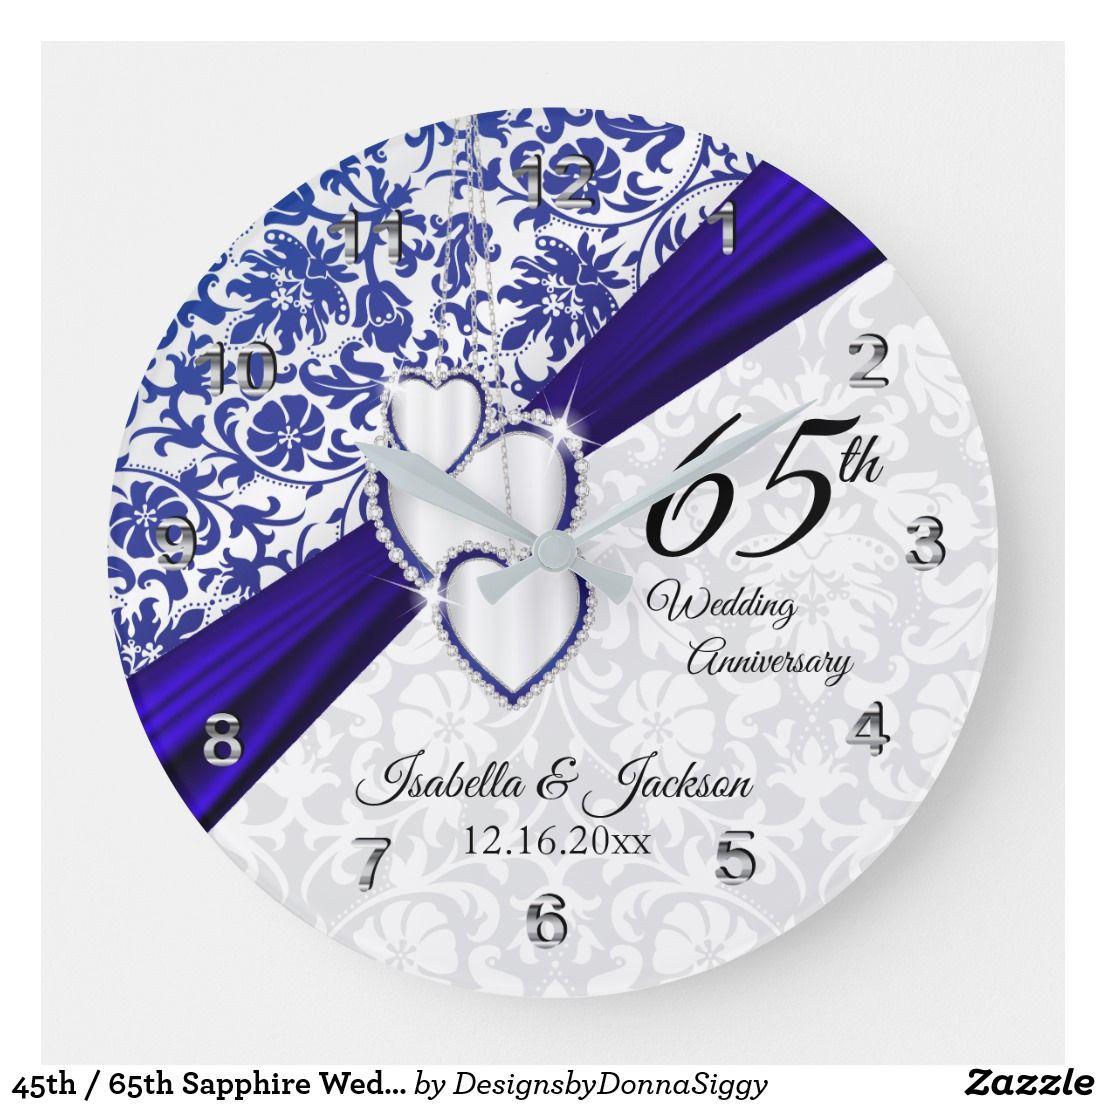 45th / 65th Sapphire Wedding Anniversary Large Clock